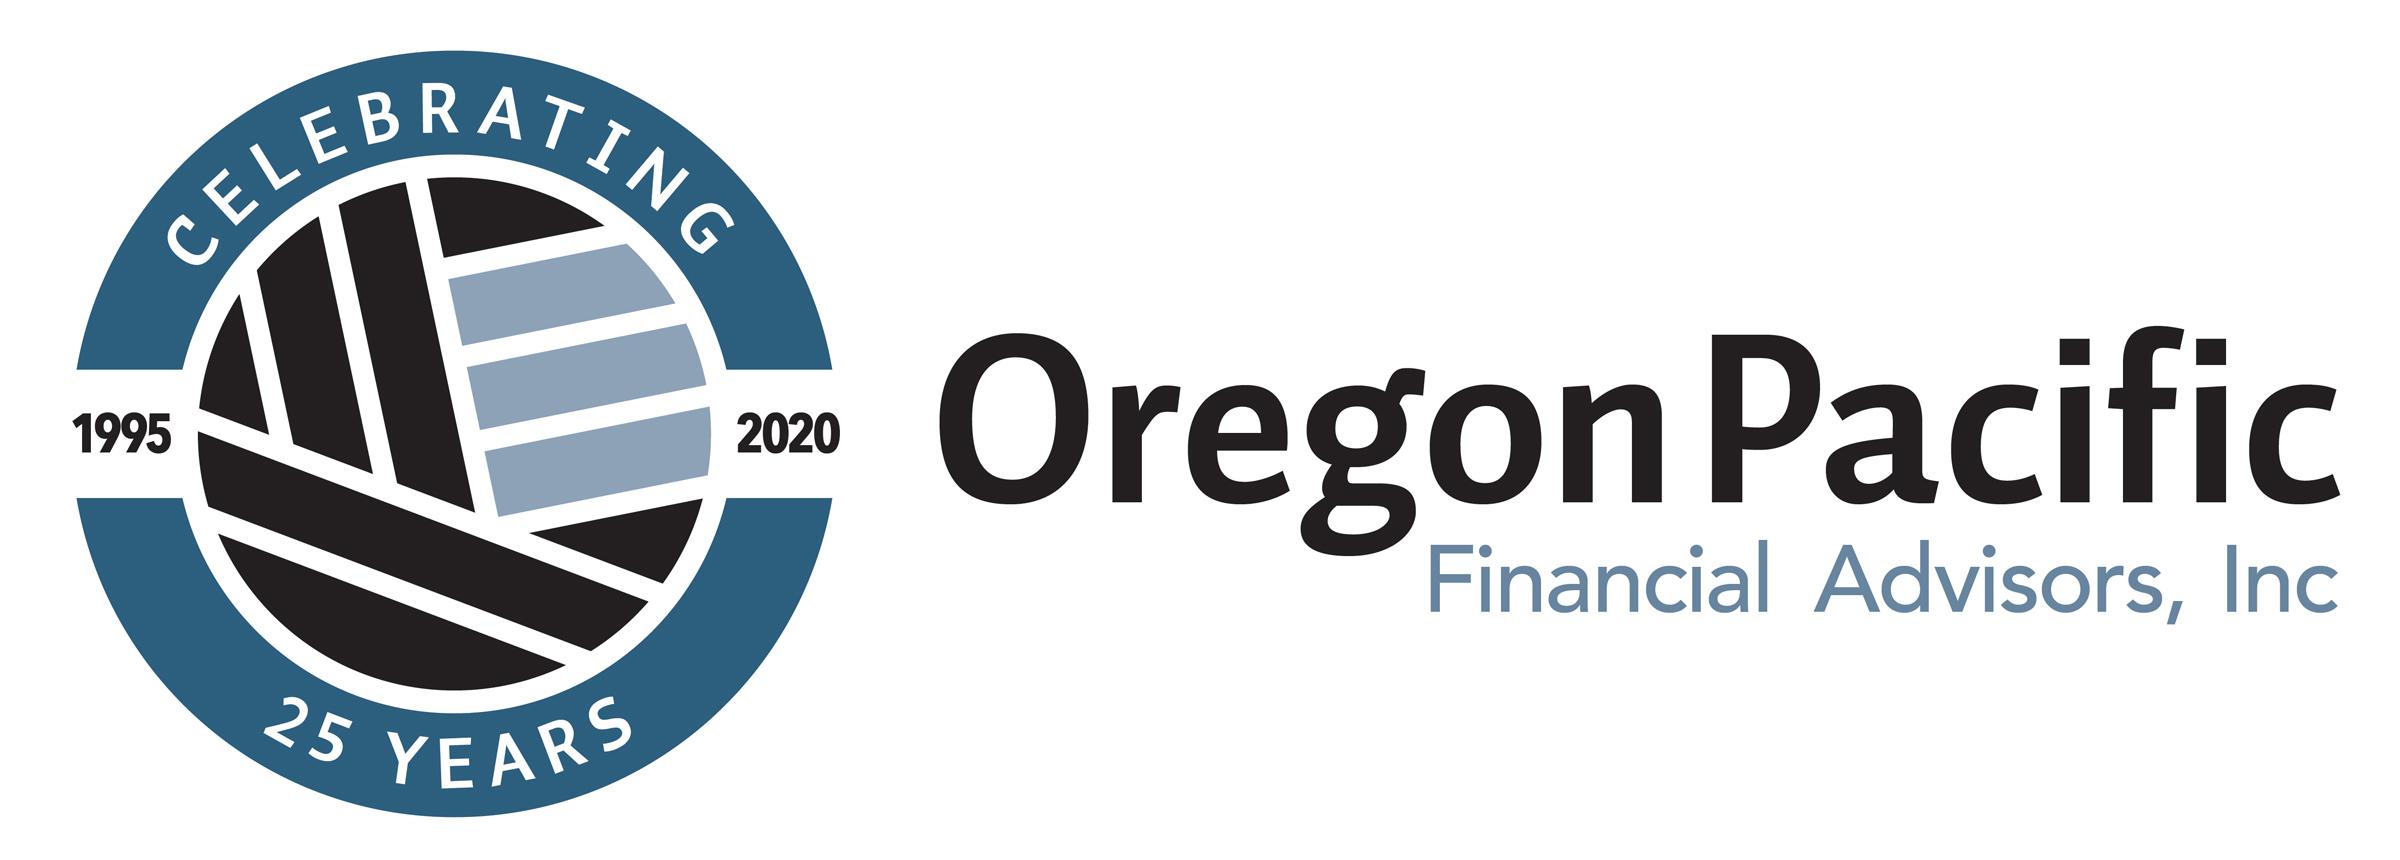 Oregon Pacific Financial Advisors 25th Anniversary Logo